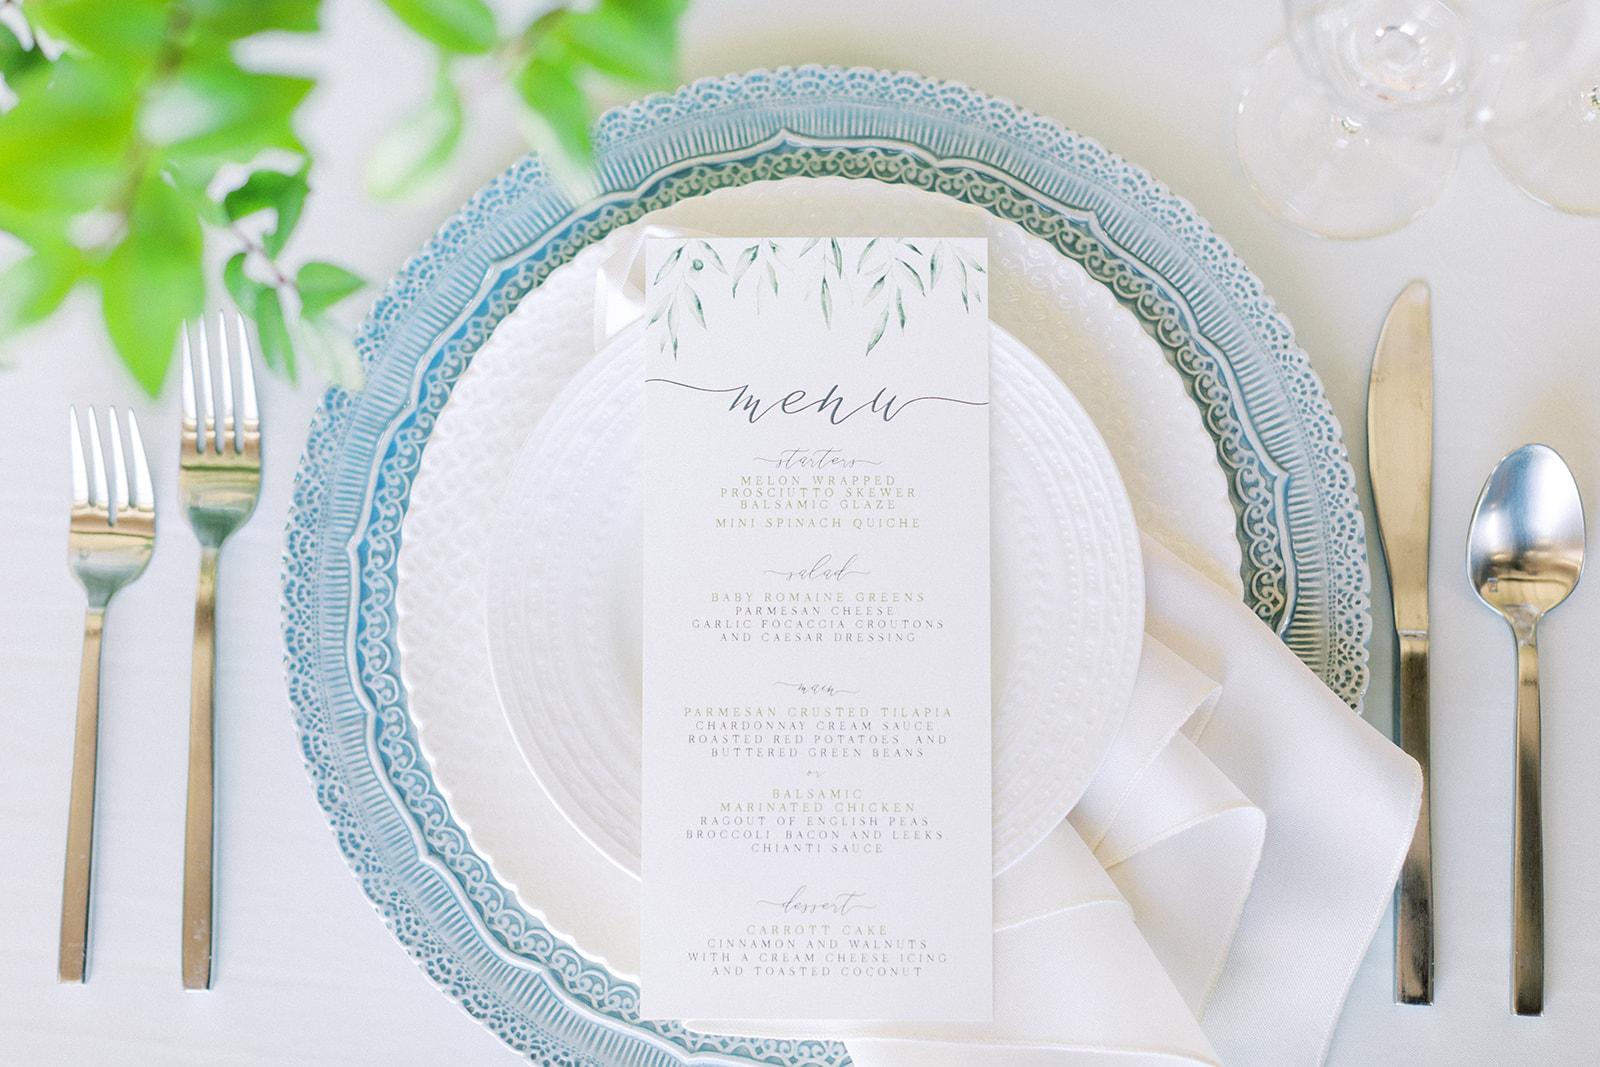 Wedding menu: Elopement vineyard wedding at Umbra Winery by Alexa Kay Events. See more wedding ideas at alexakayevents.com!